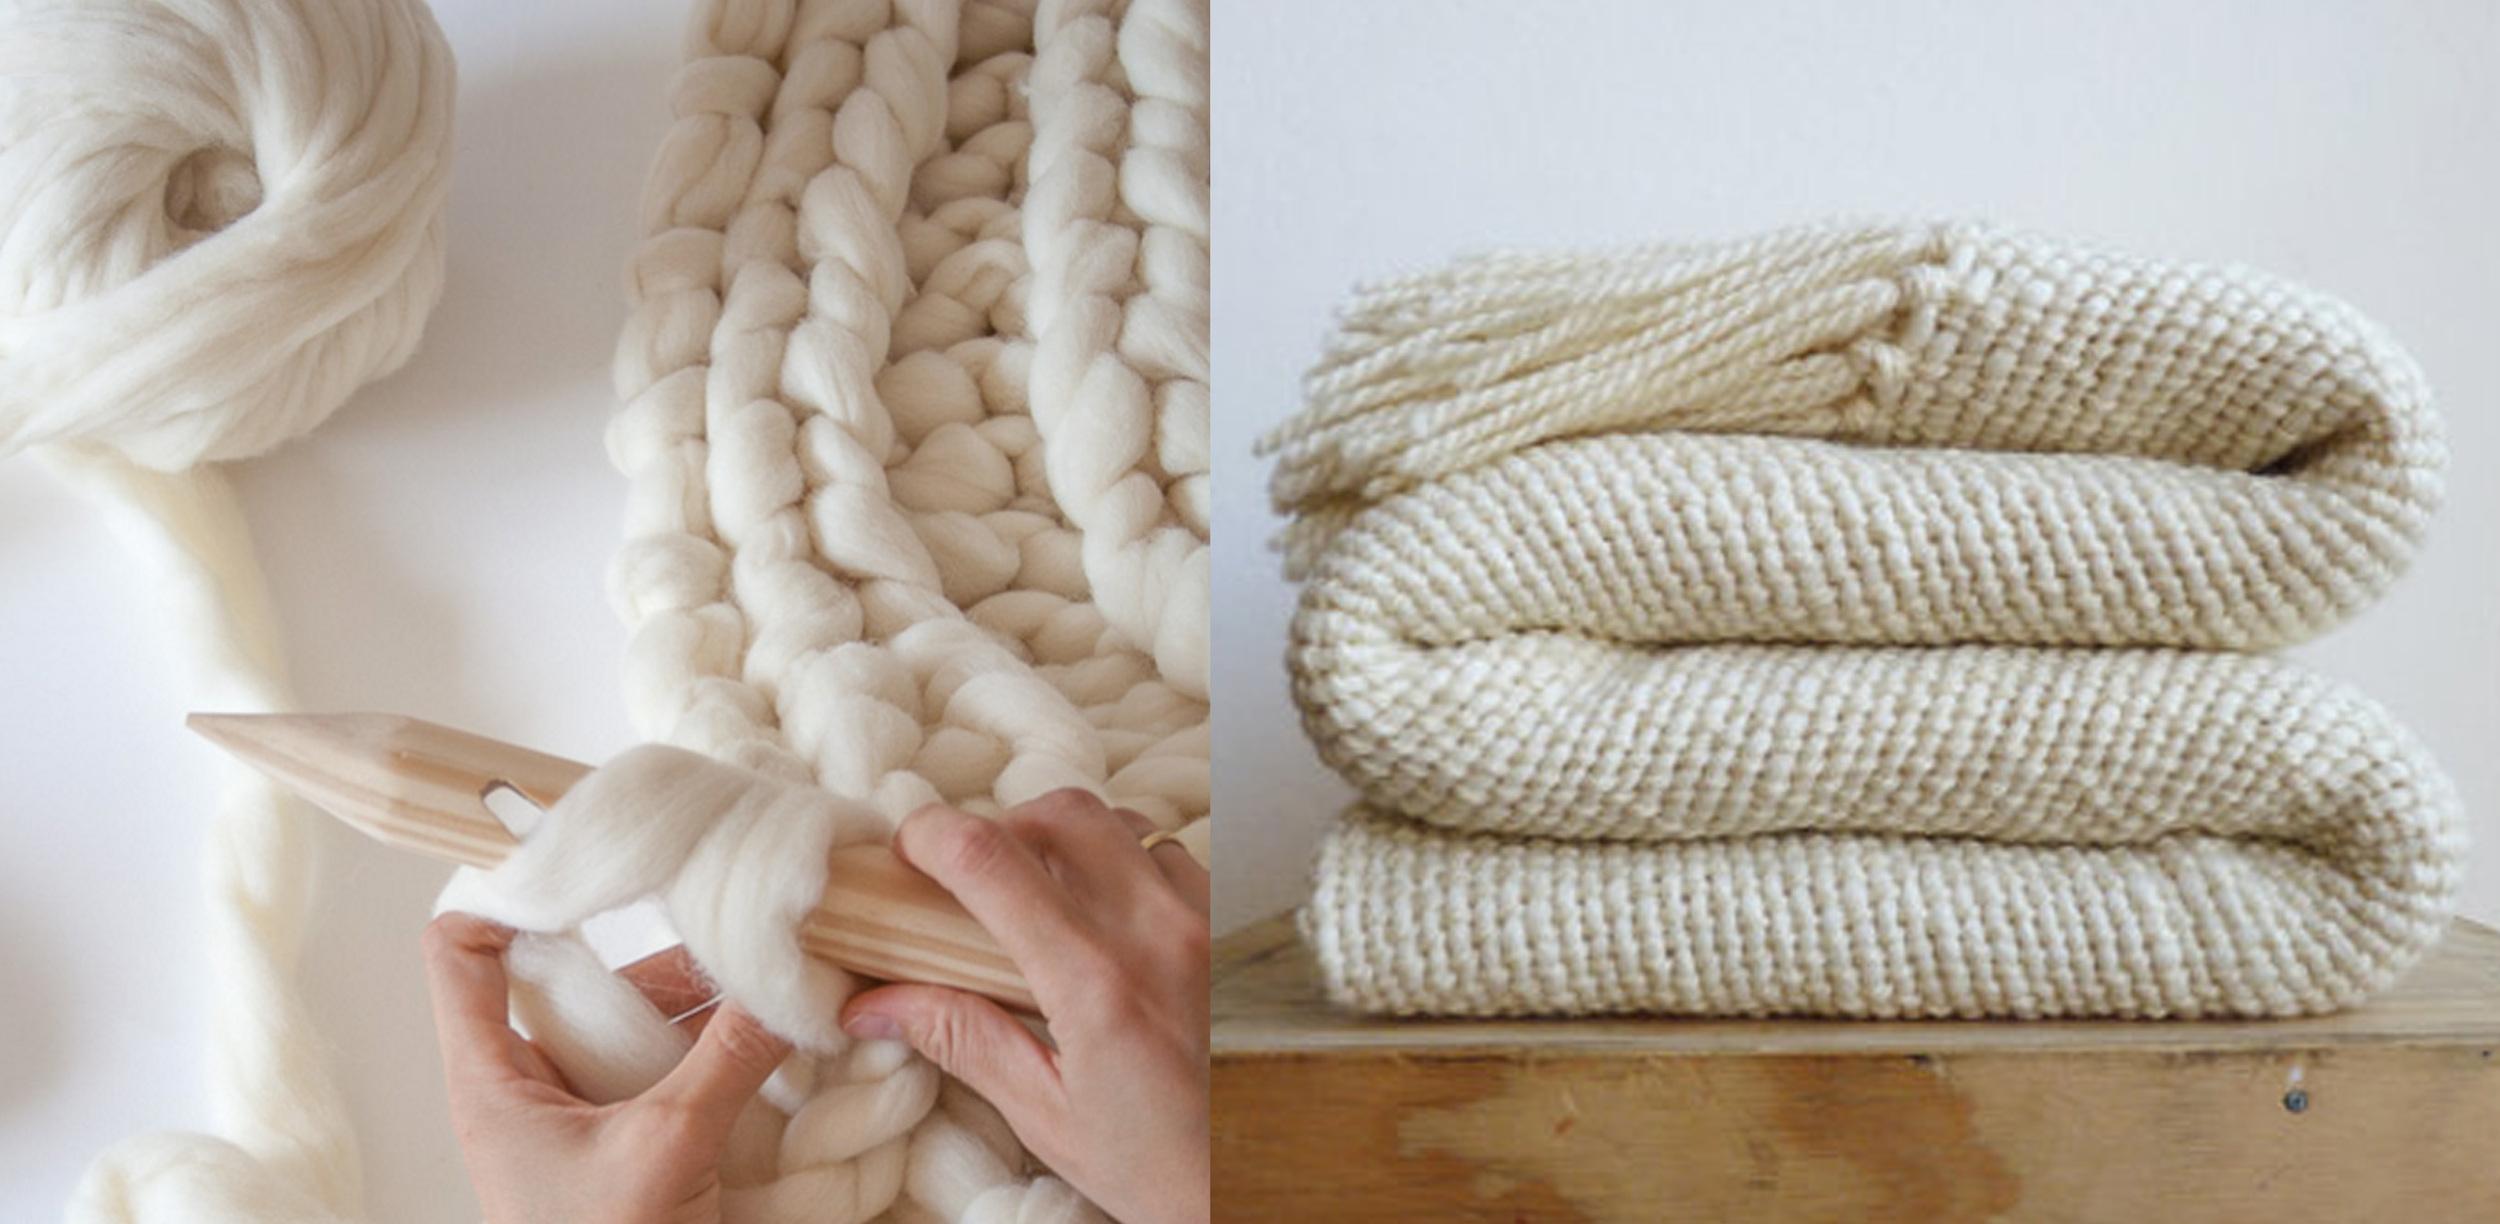 Knitting Noodles  - woven blanket  Texturable Decor